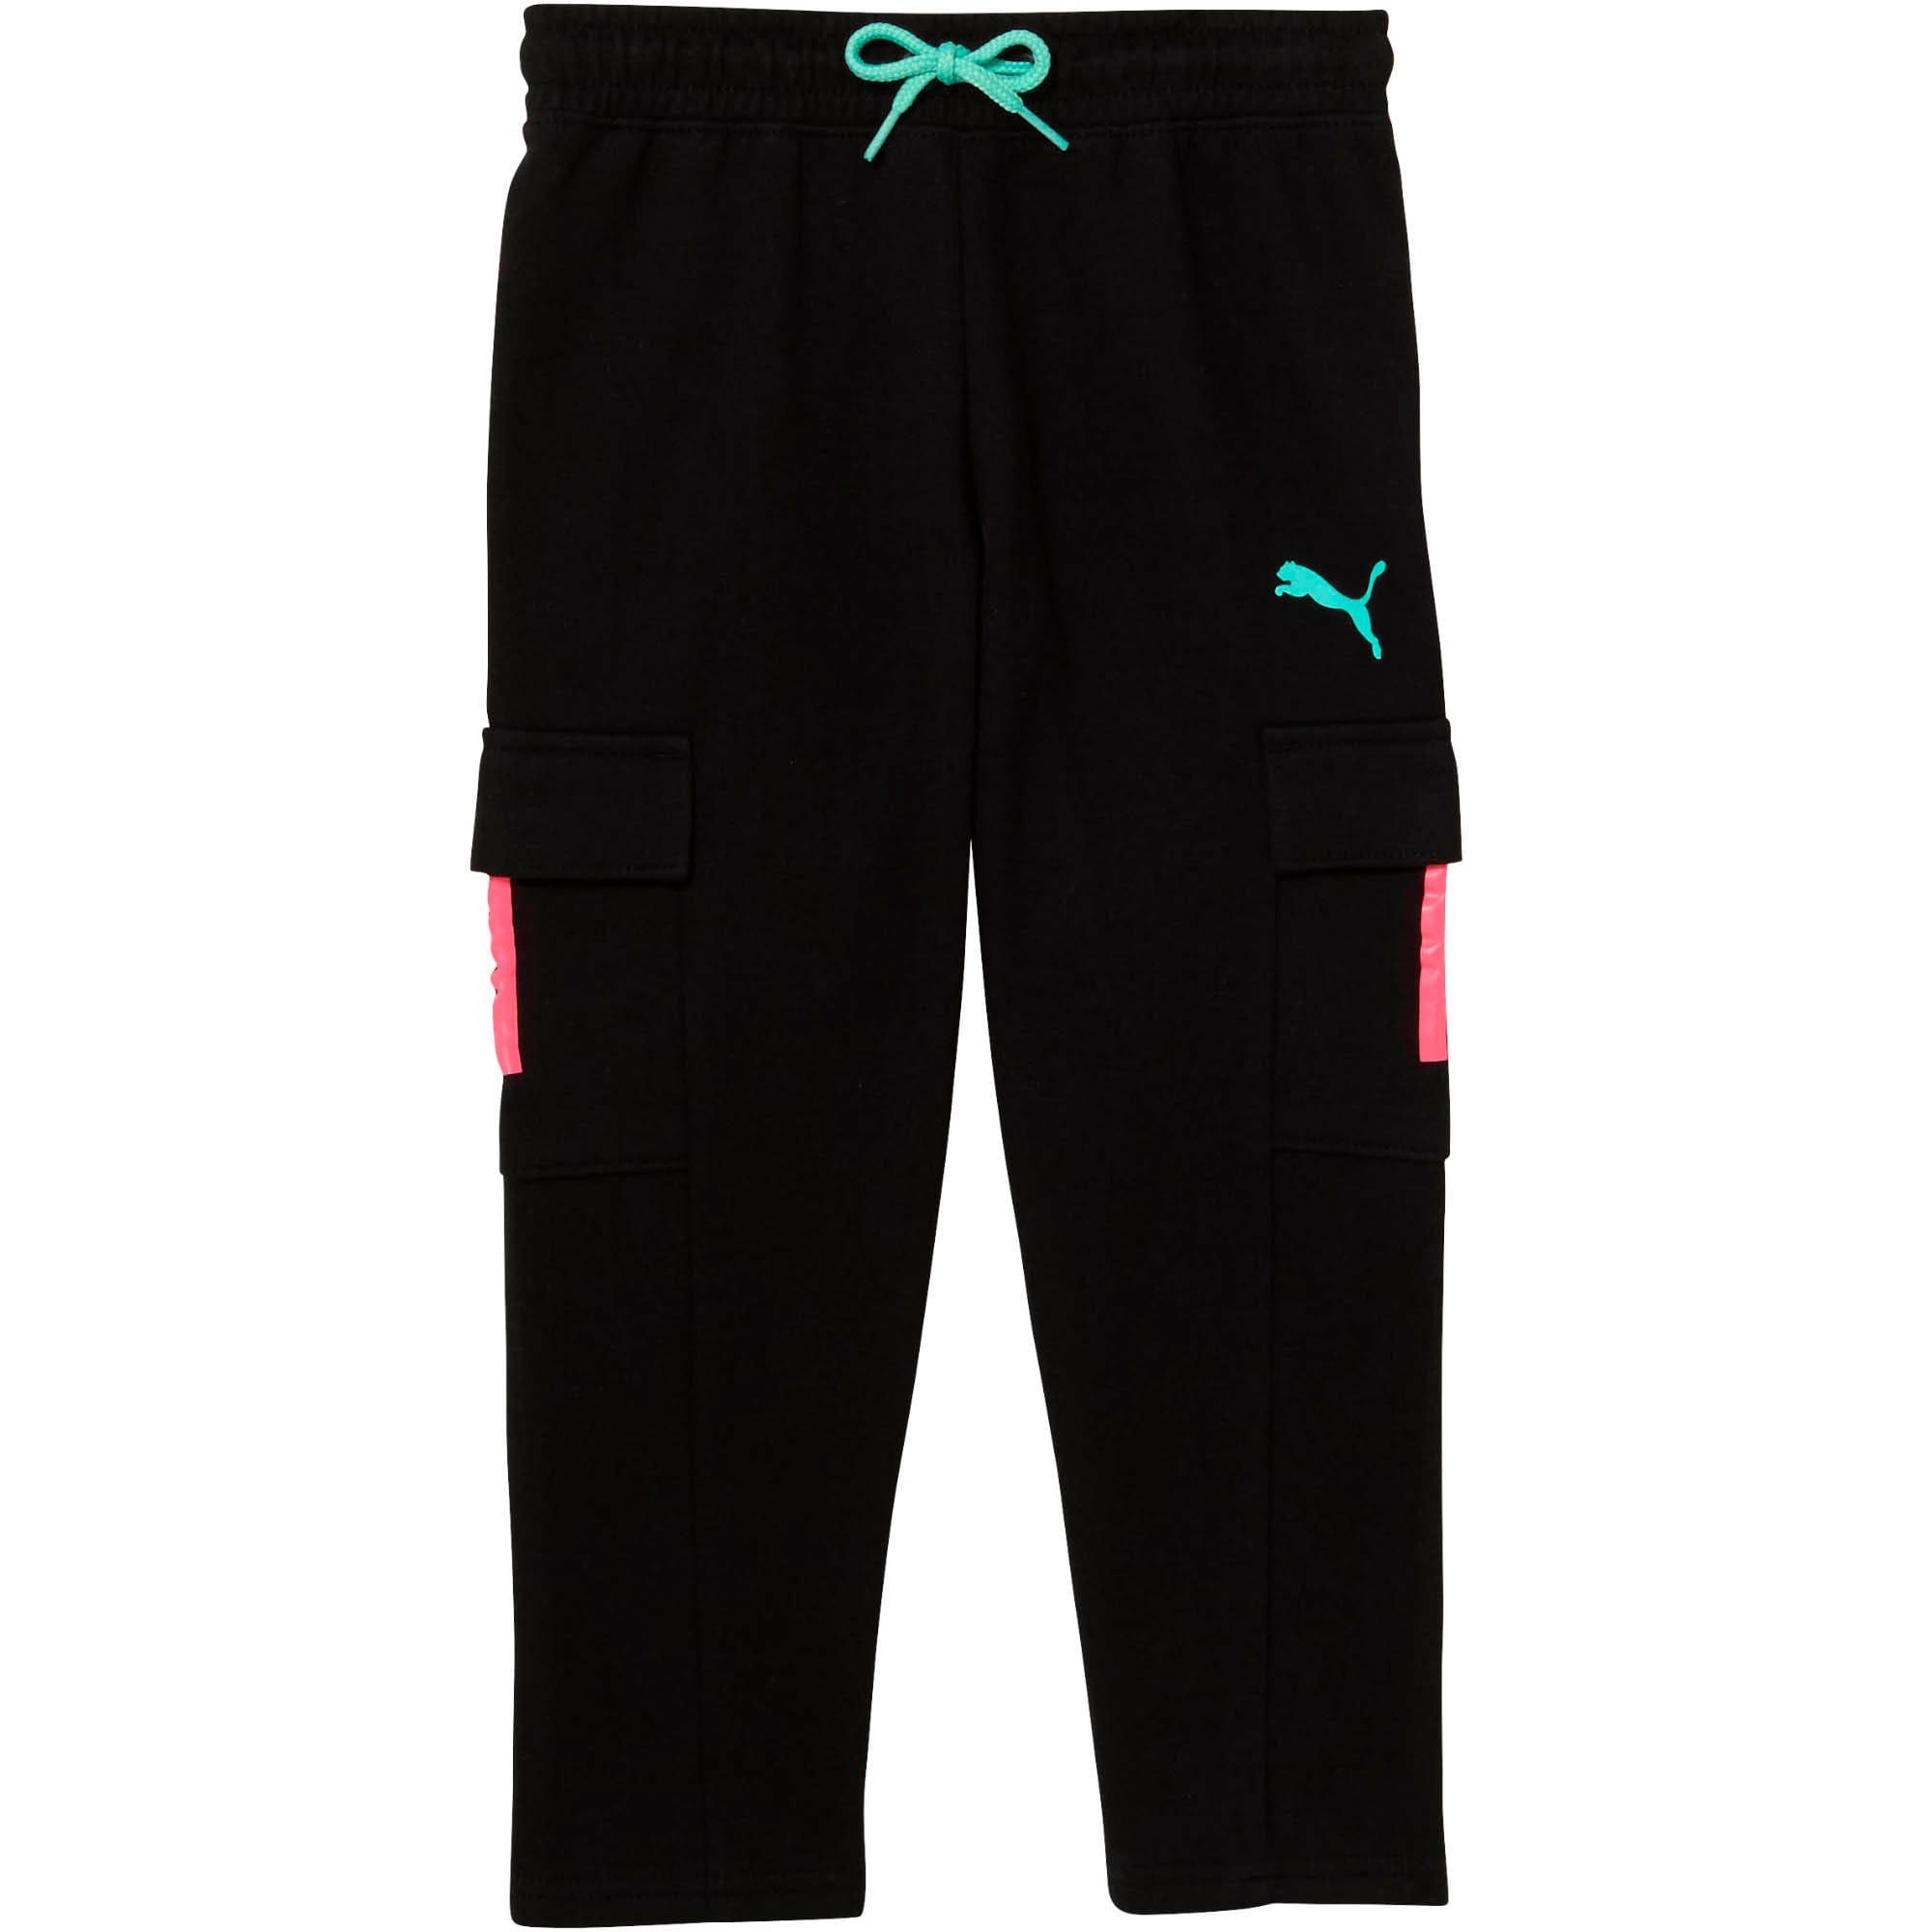 Thumbnail 1 of Little Kids' Cargo Pants, PUMA BLACK, medium